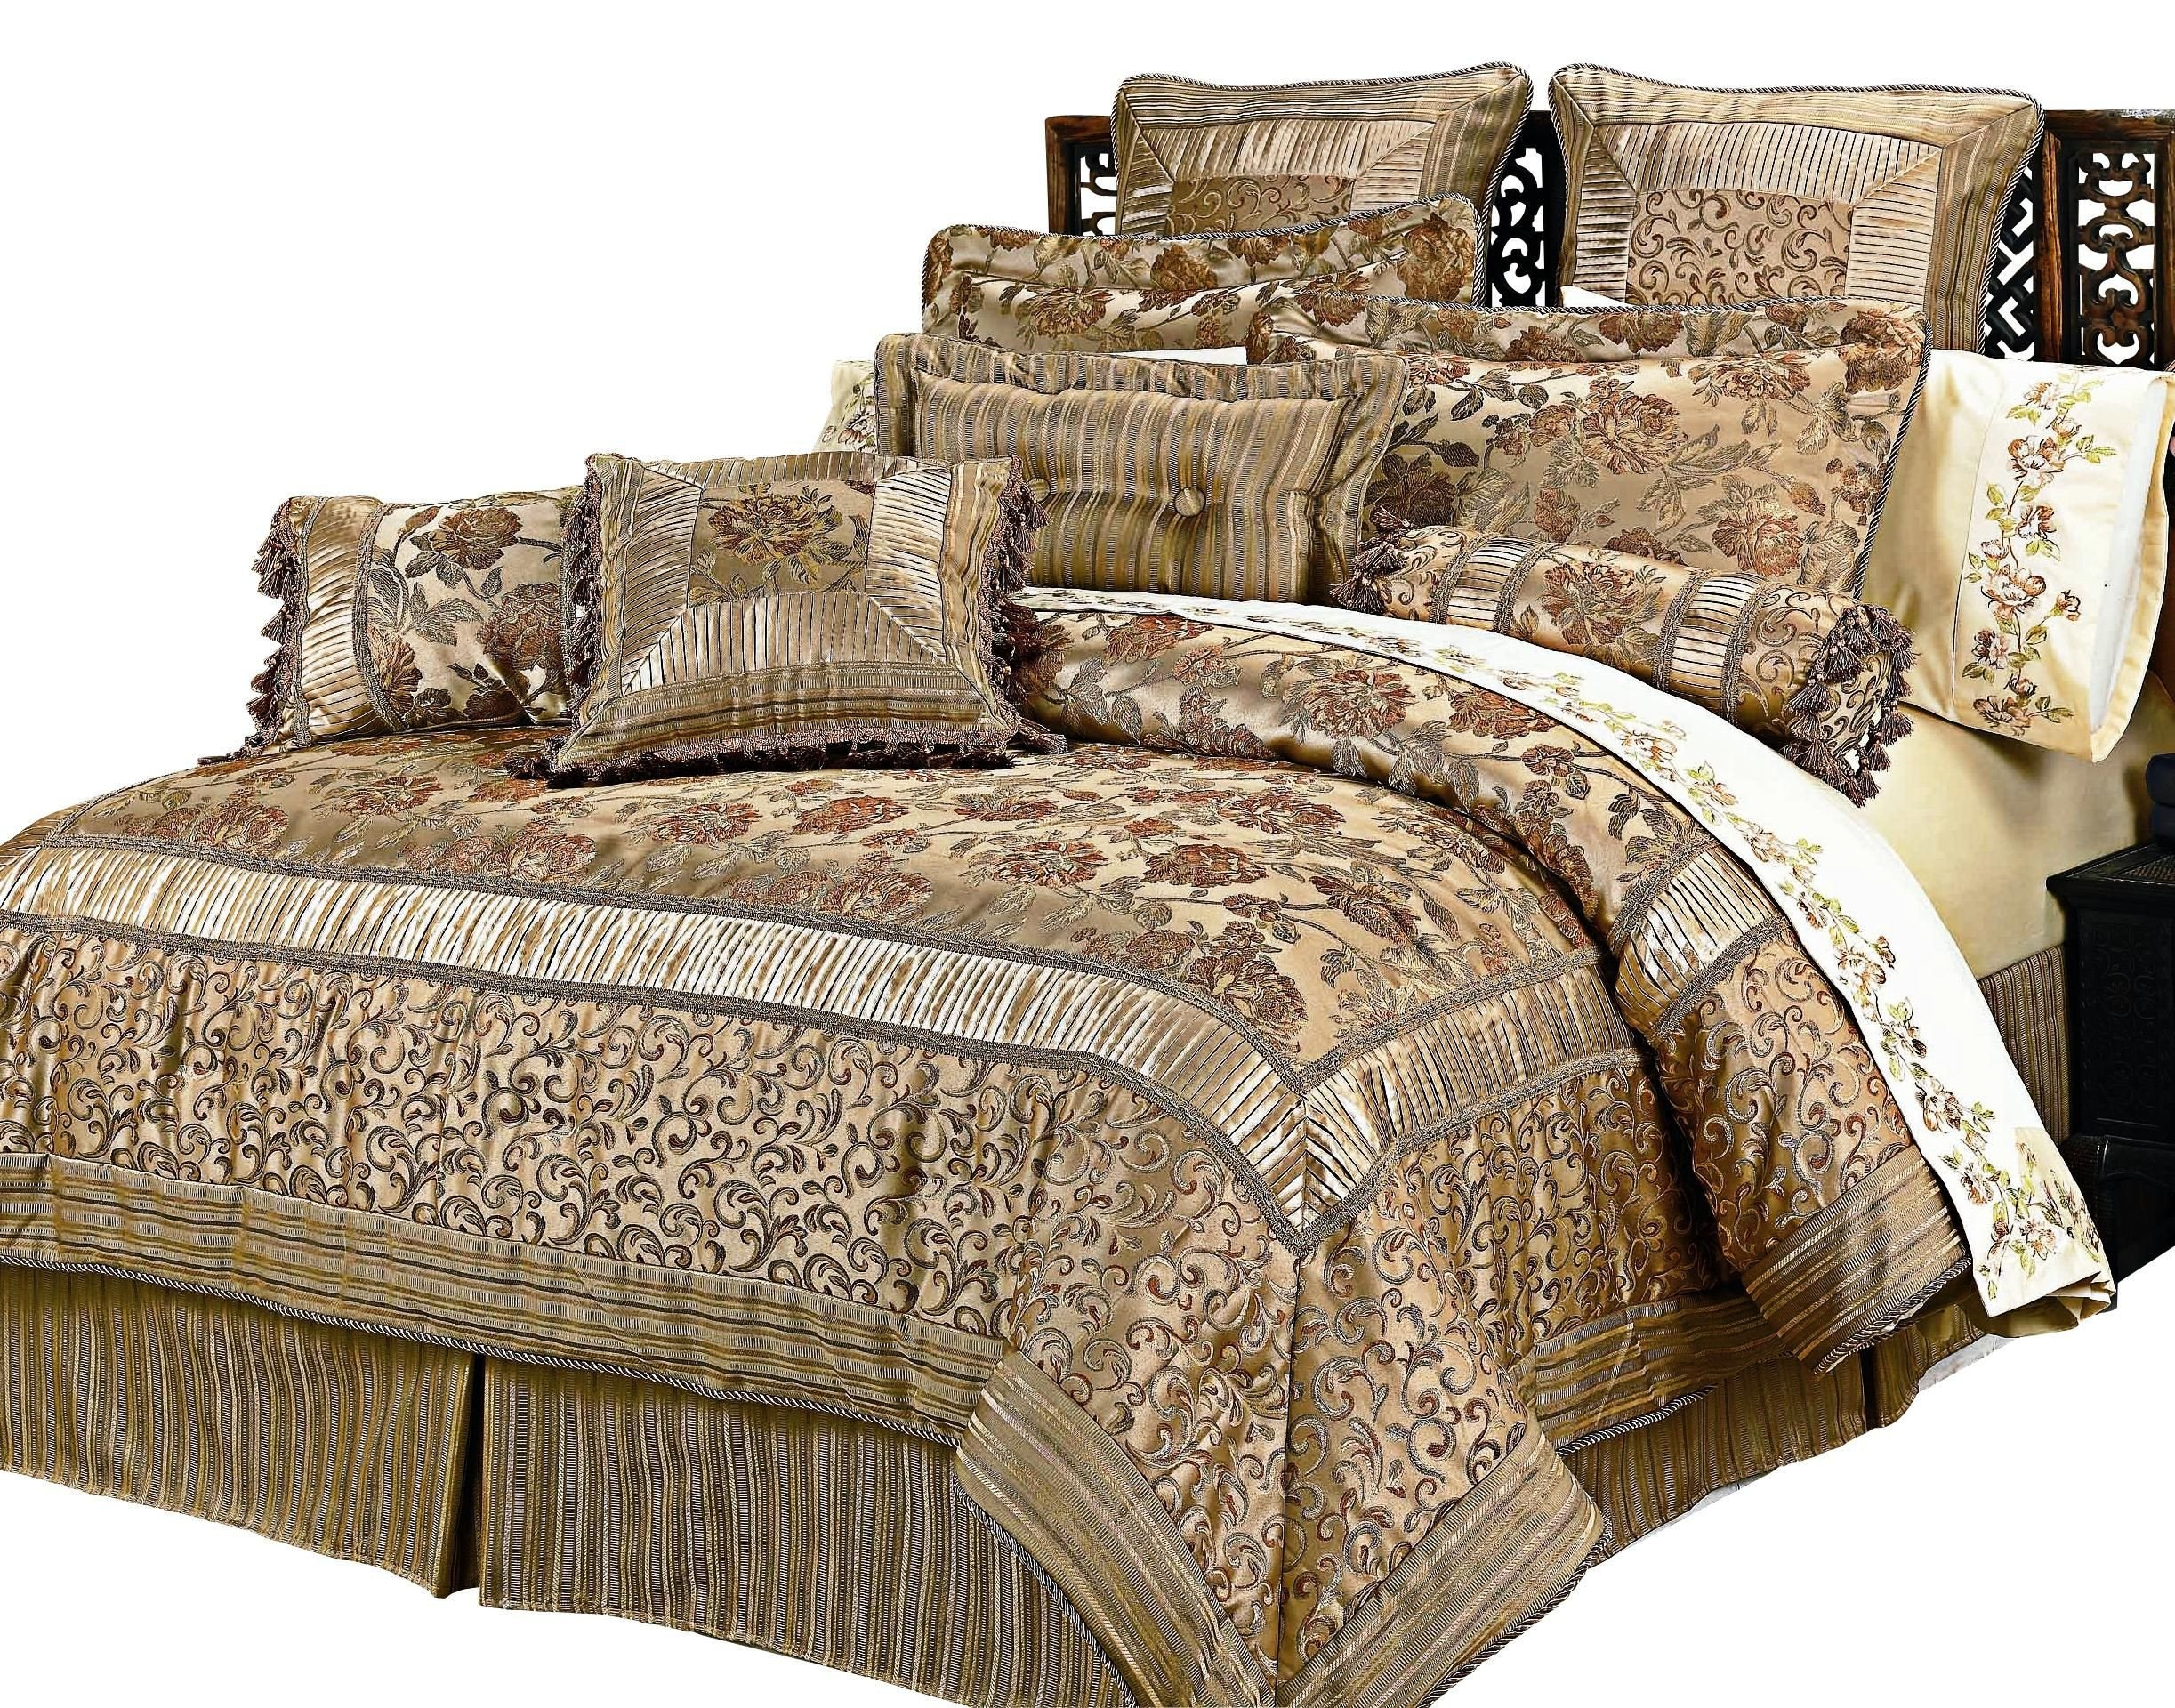 Kathy Ireland Bedroom Furniture Fresh Kathy Ireland Romantic Dreams forter Bedding Set